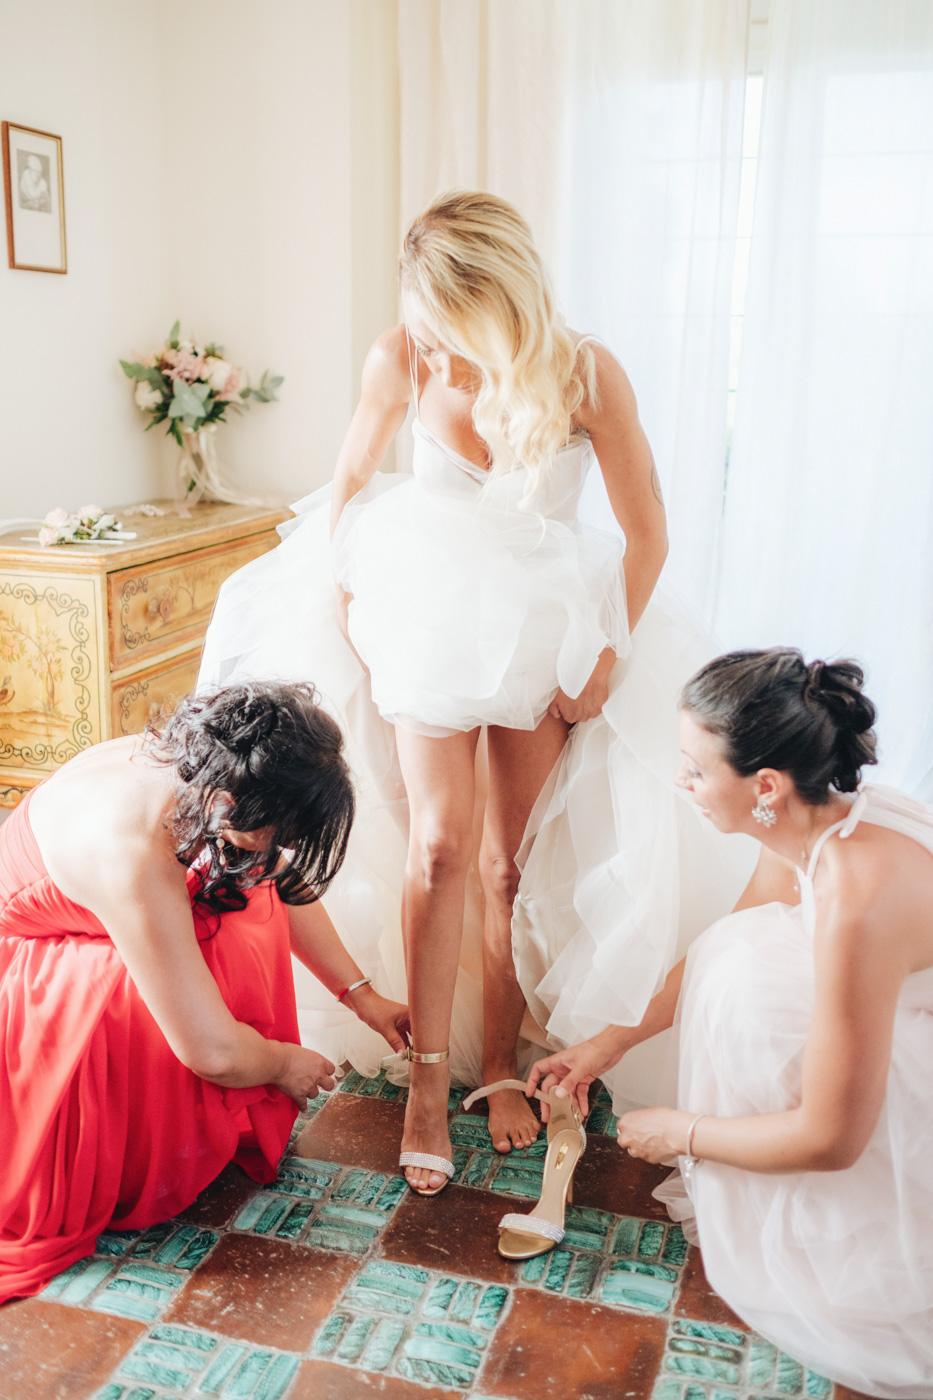 Matrimoni all'italiana wedding photographer italy-41.jpg